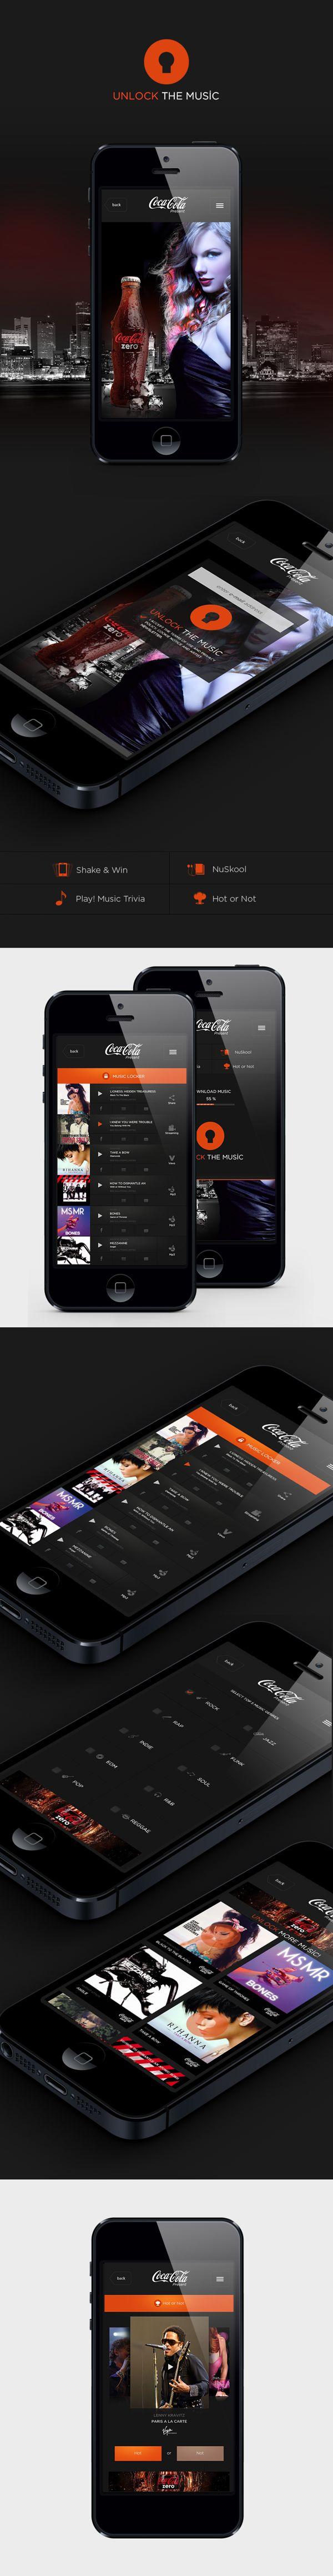 Coca Cola Music by Turkan Kalbiyeva, via Behance